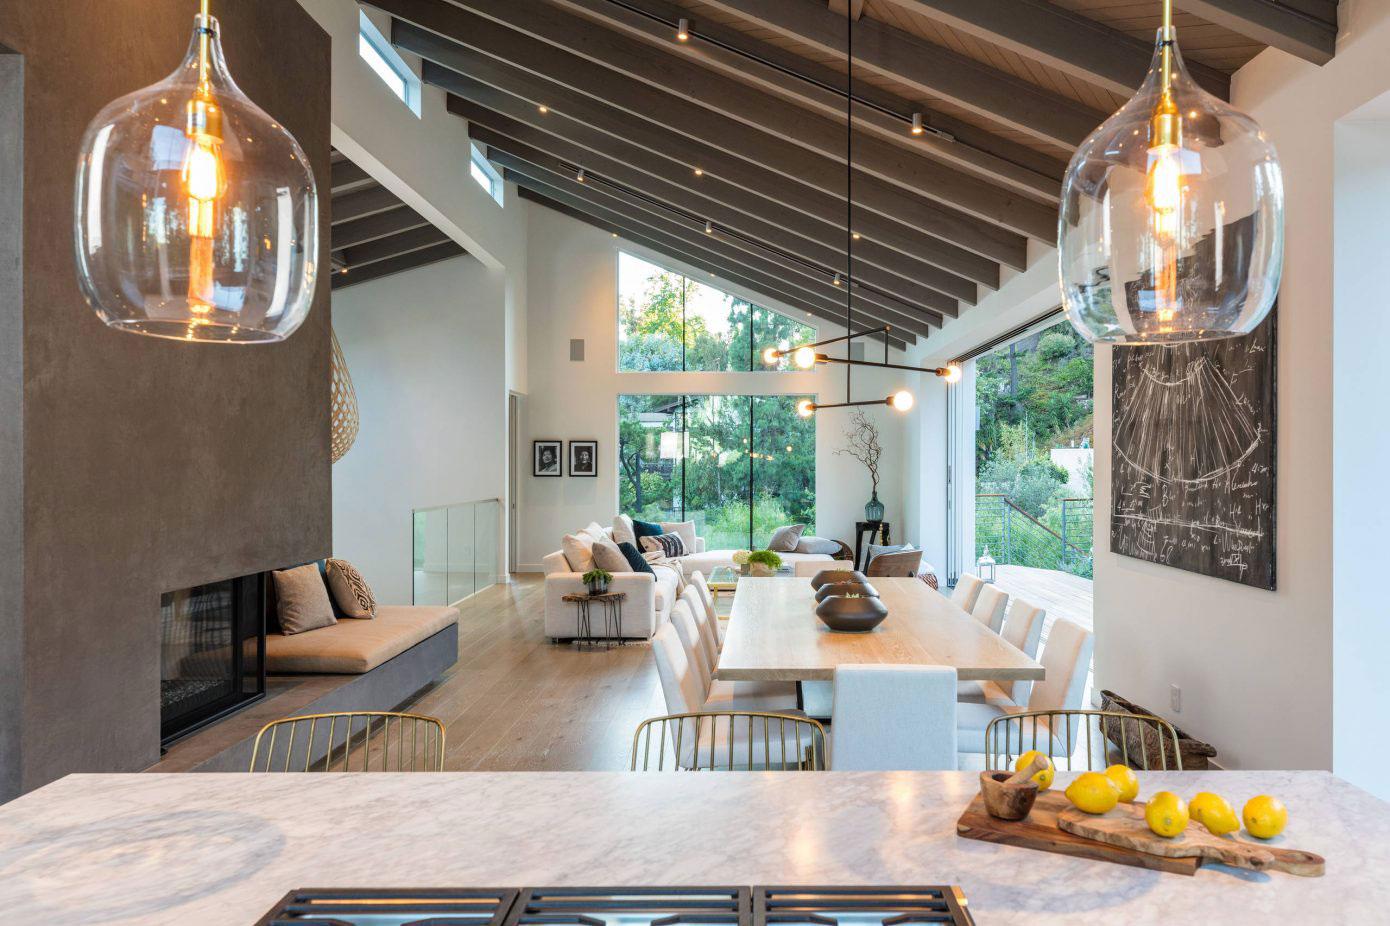 Modern fireplace, pendant lighting